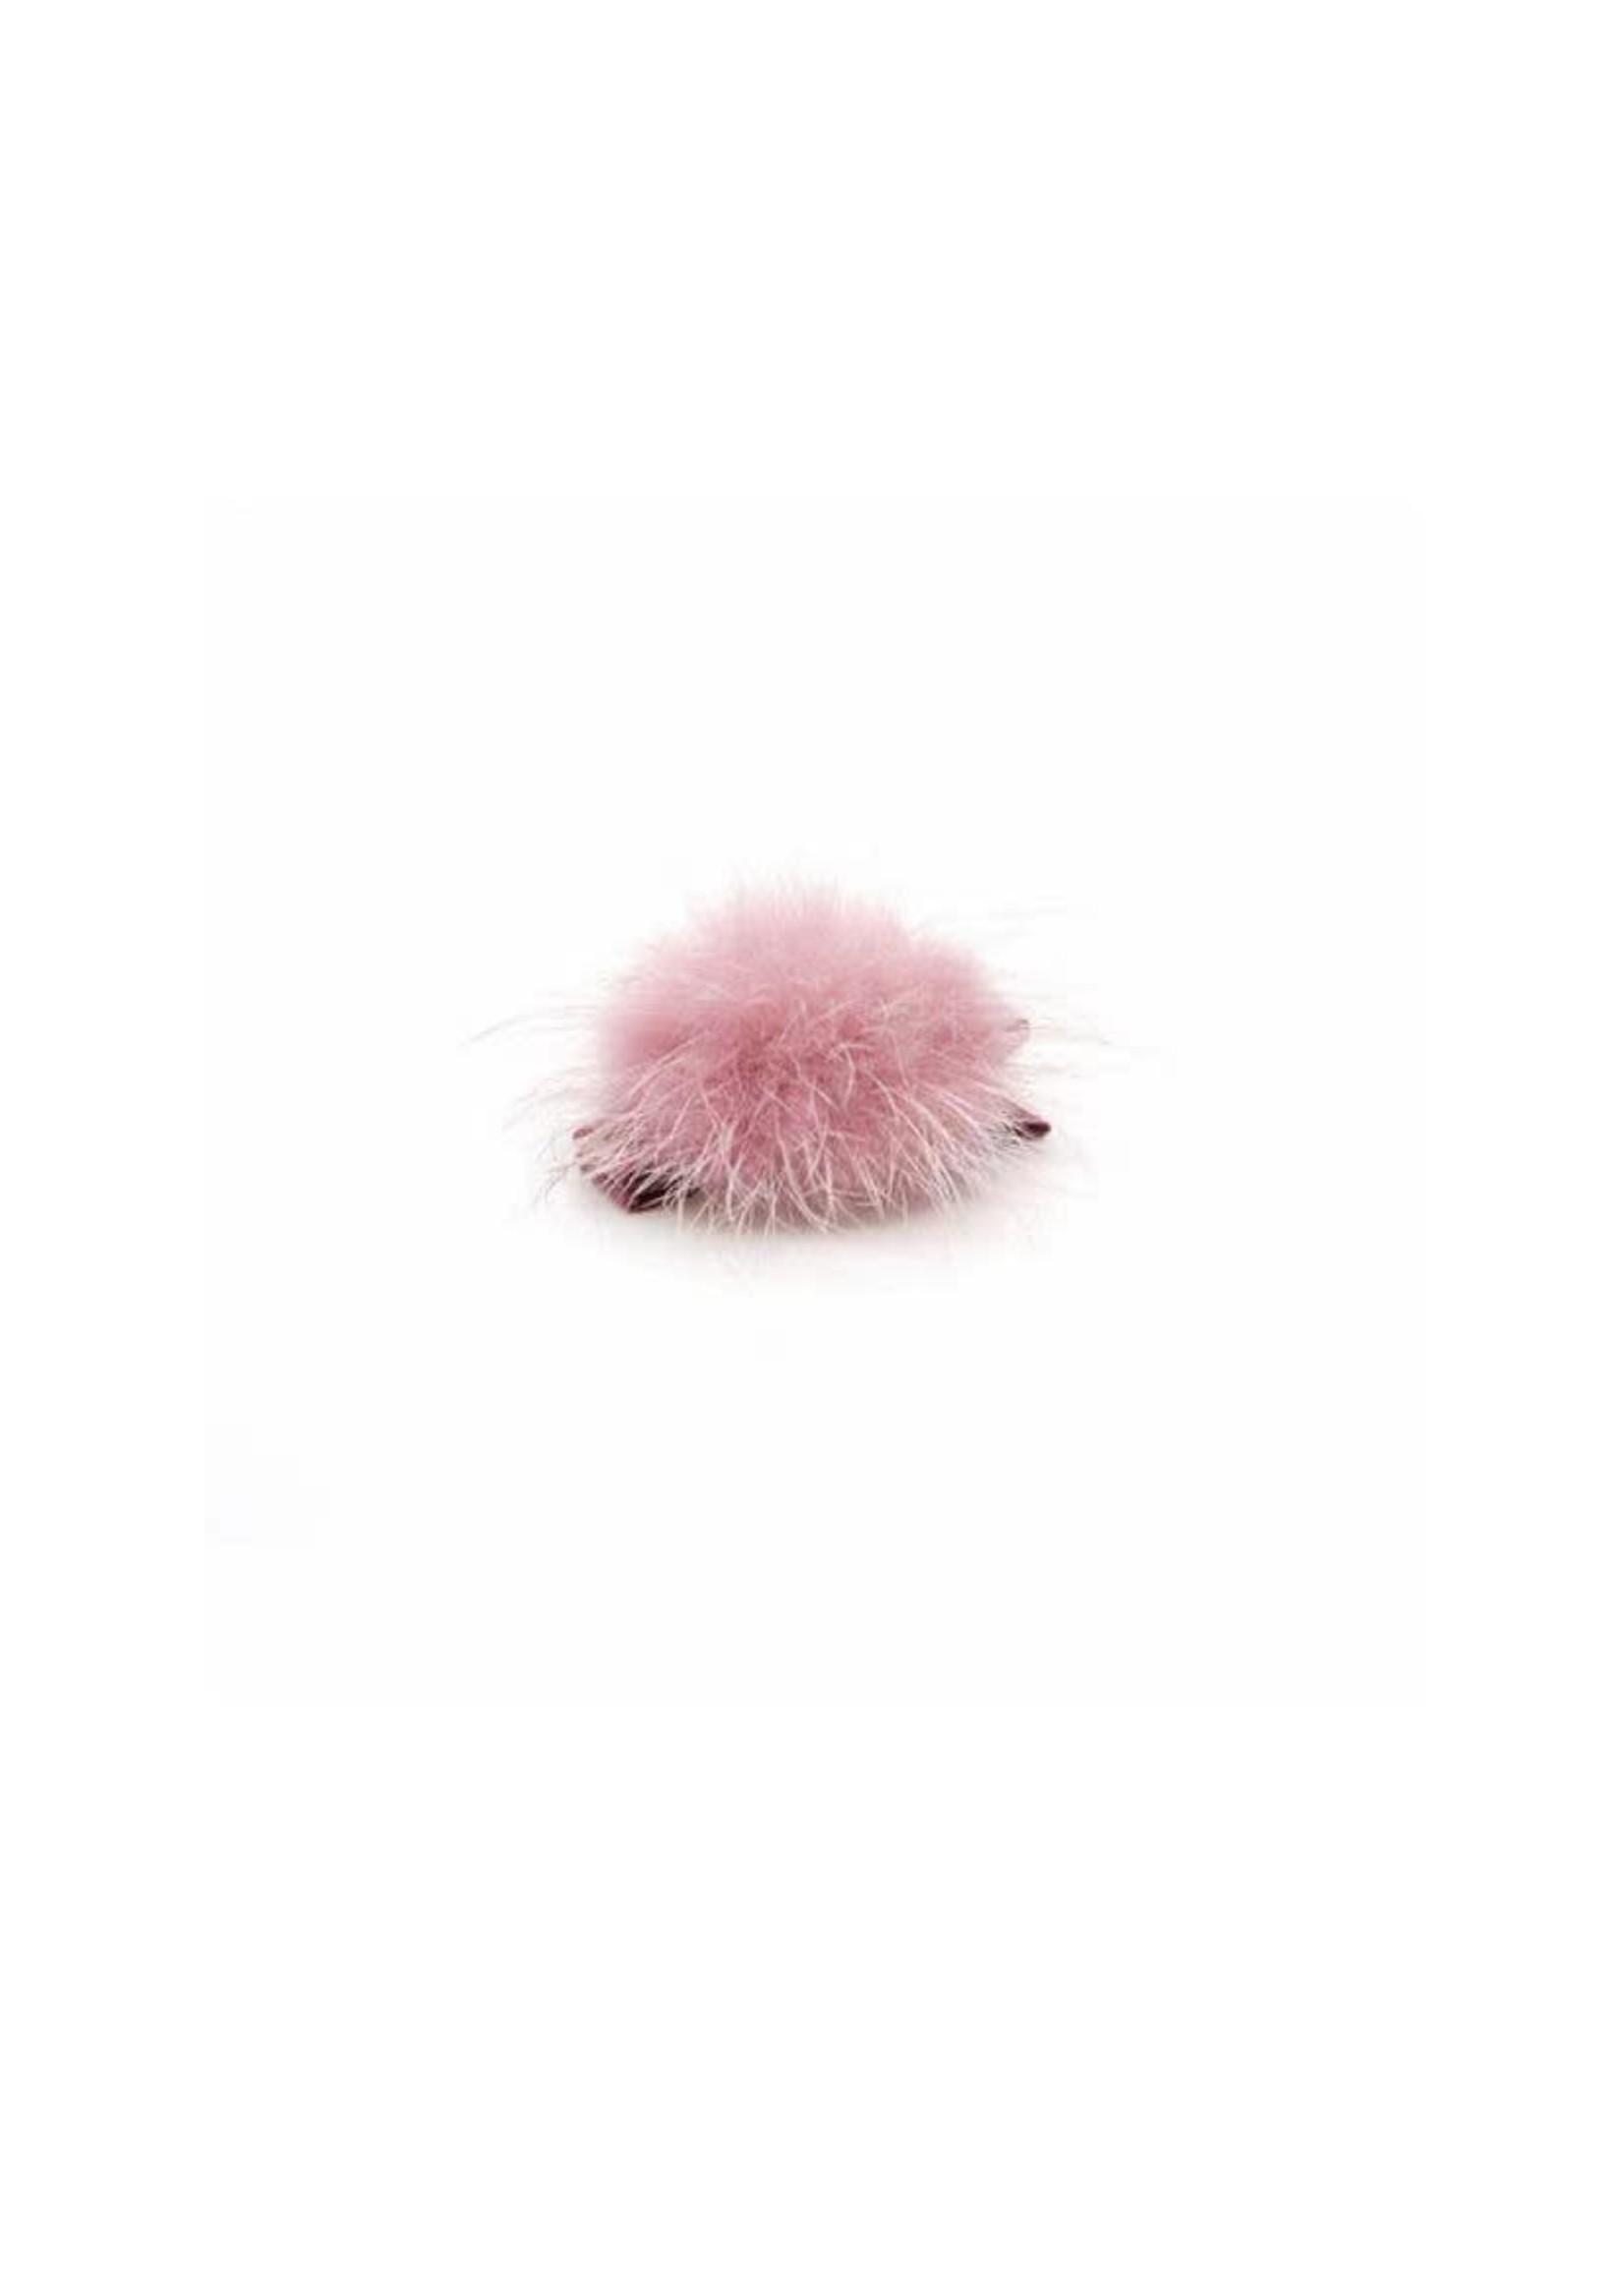 Olilia Small Mink Puff Hair Clip - Sweet Nectar